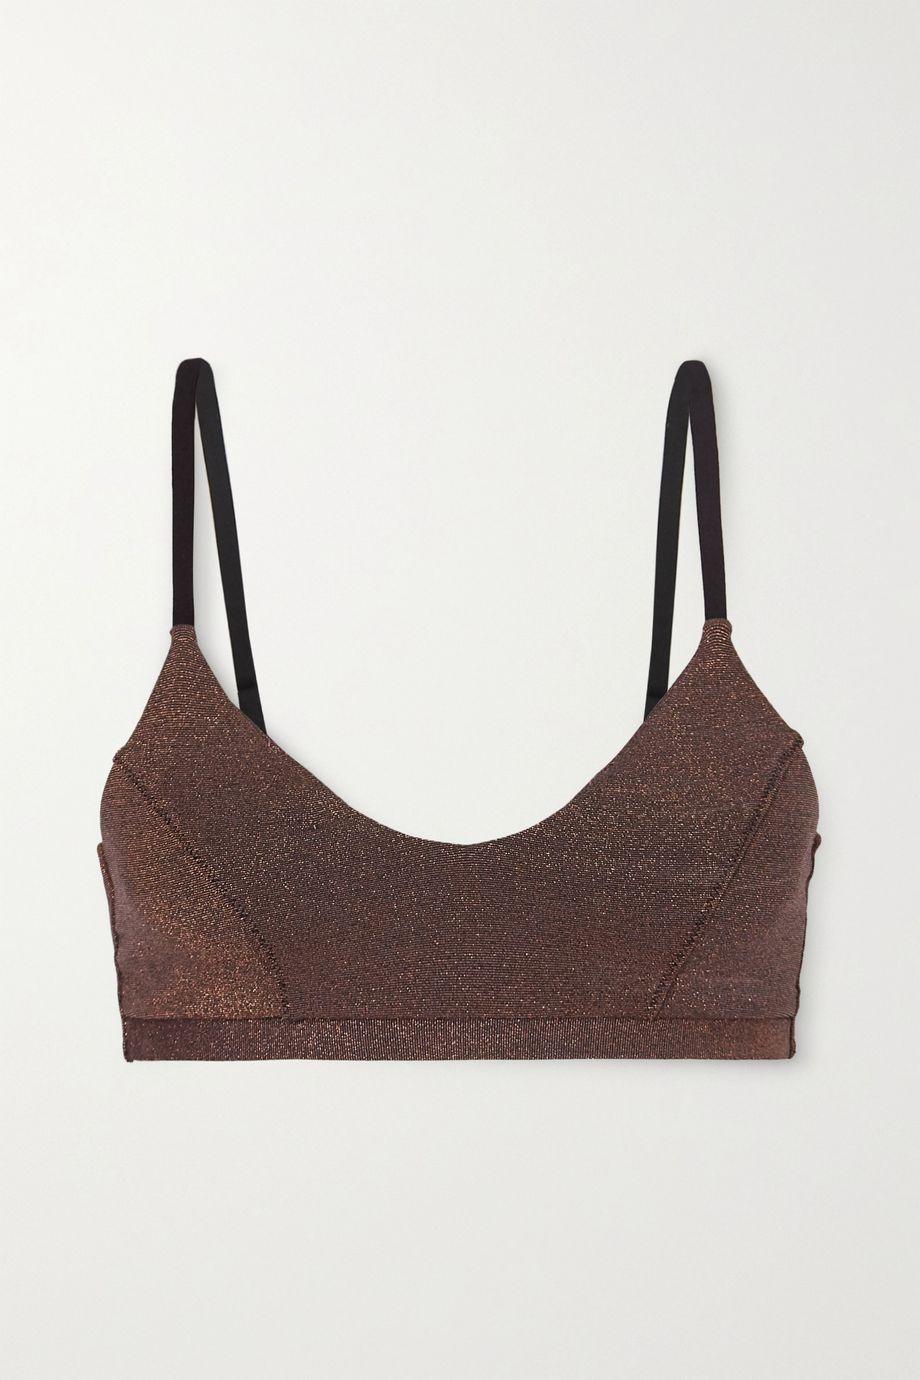 The Upside Aquarius Ballet metallic stretch sports bra